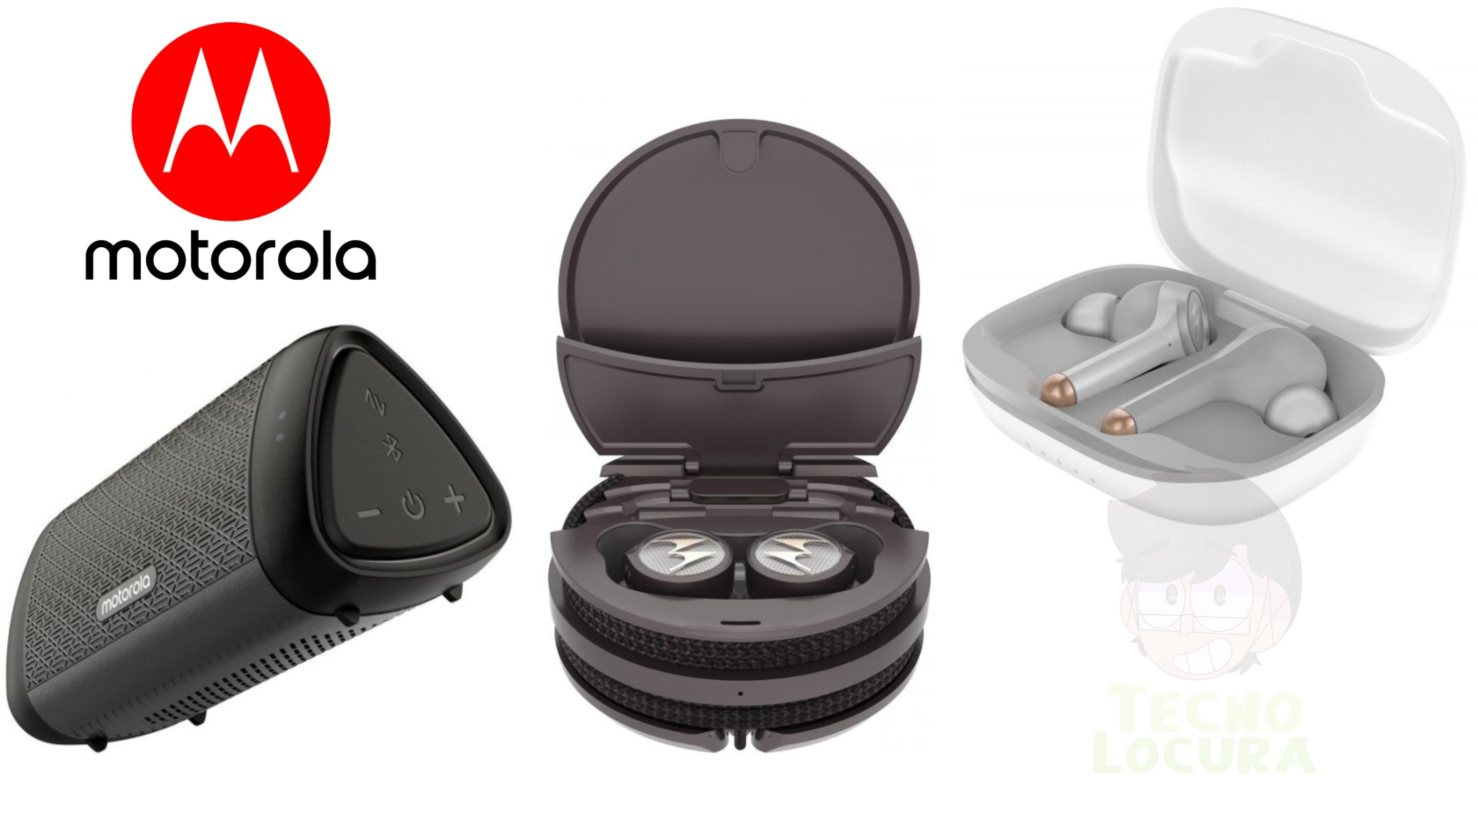 Motorola gama Lifestyle